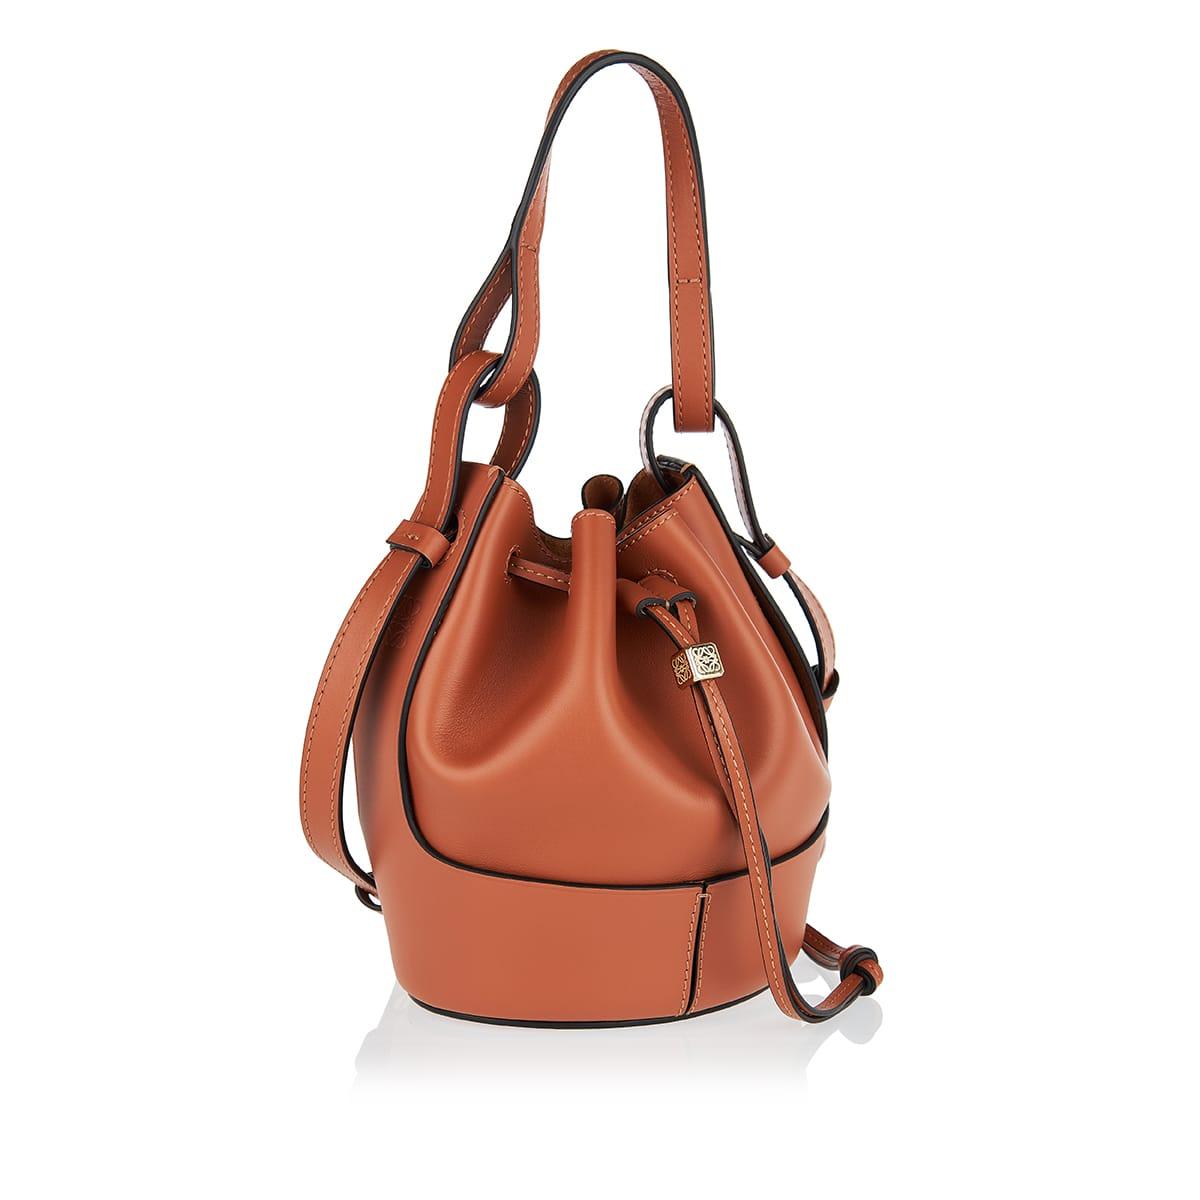 Balloon mini leather bag